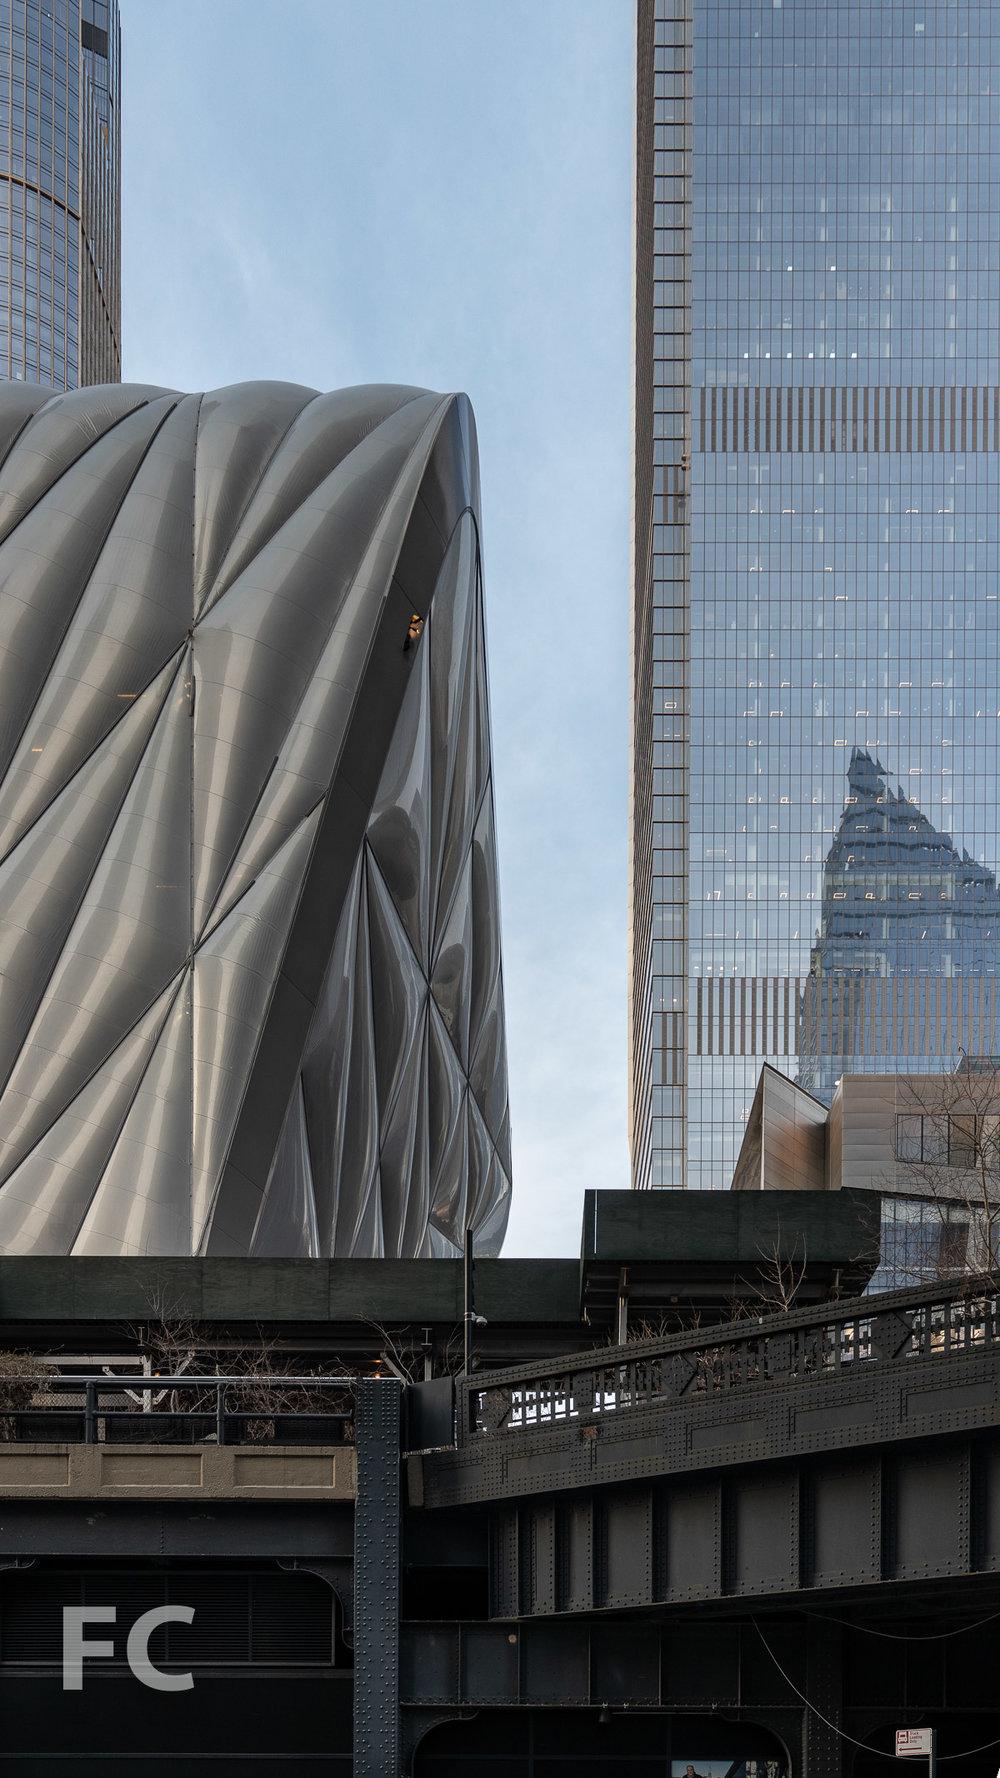 2019_03_30-The Shed at Hudson Yards-DSC09553.jpg